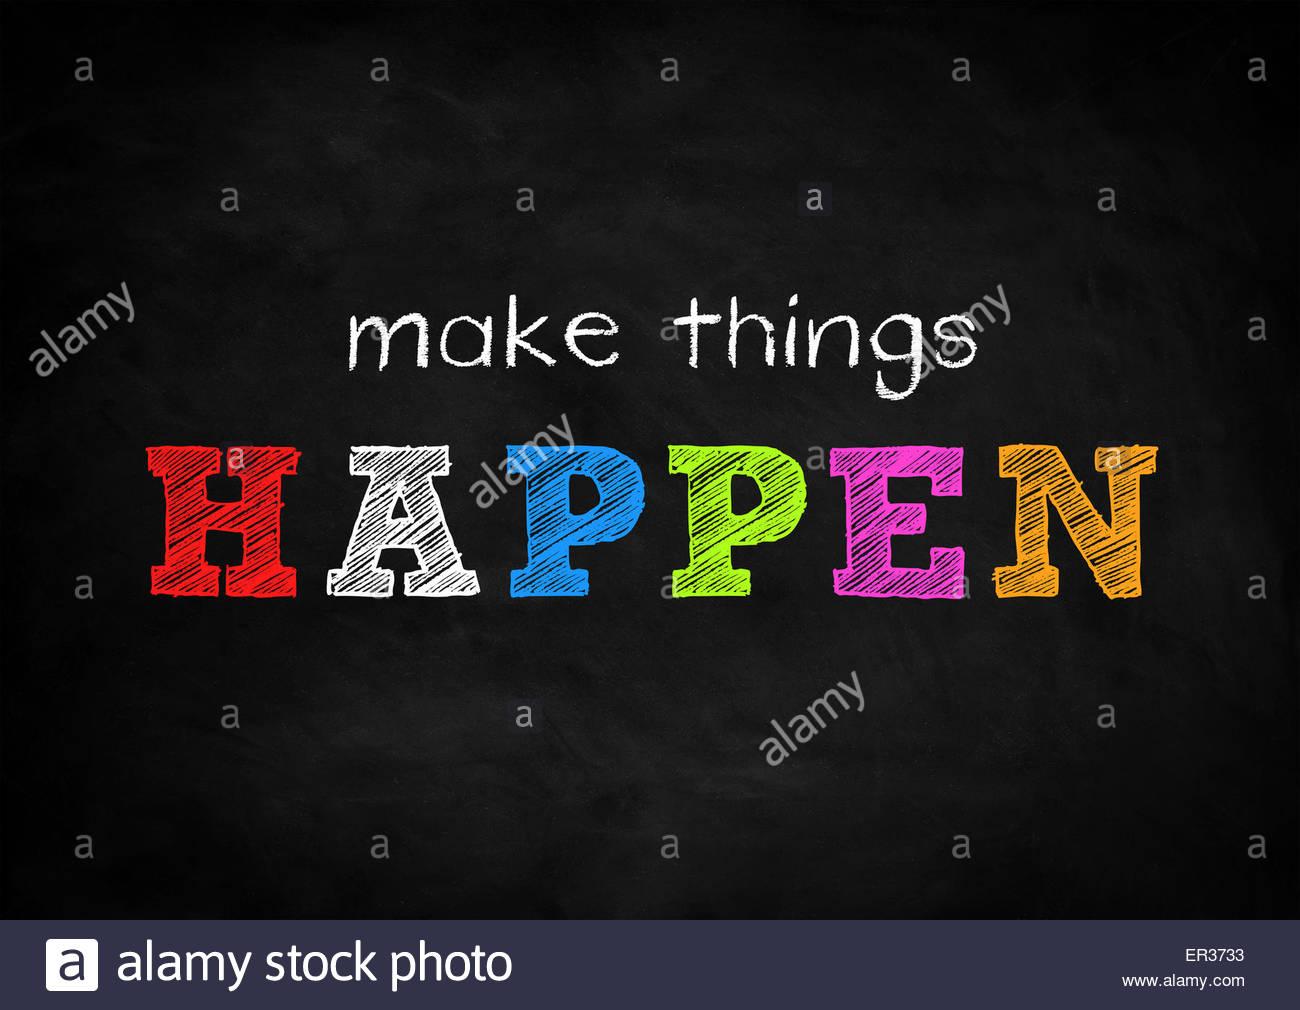 make things happen - Stock Image